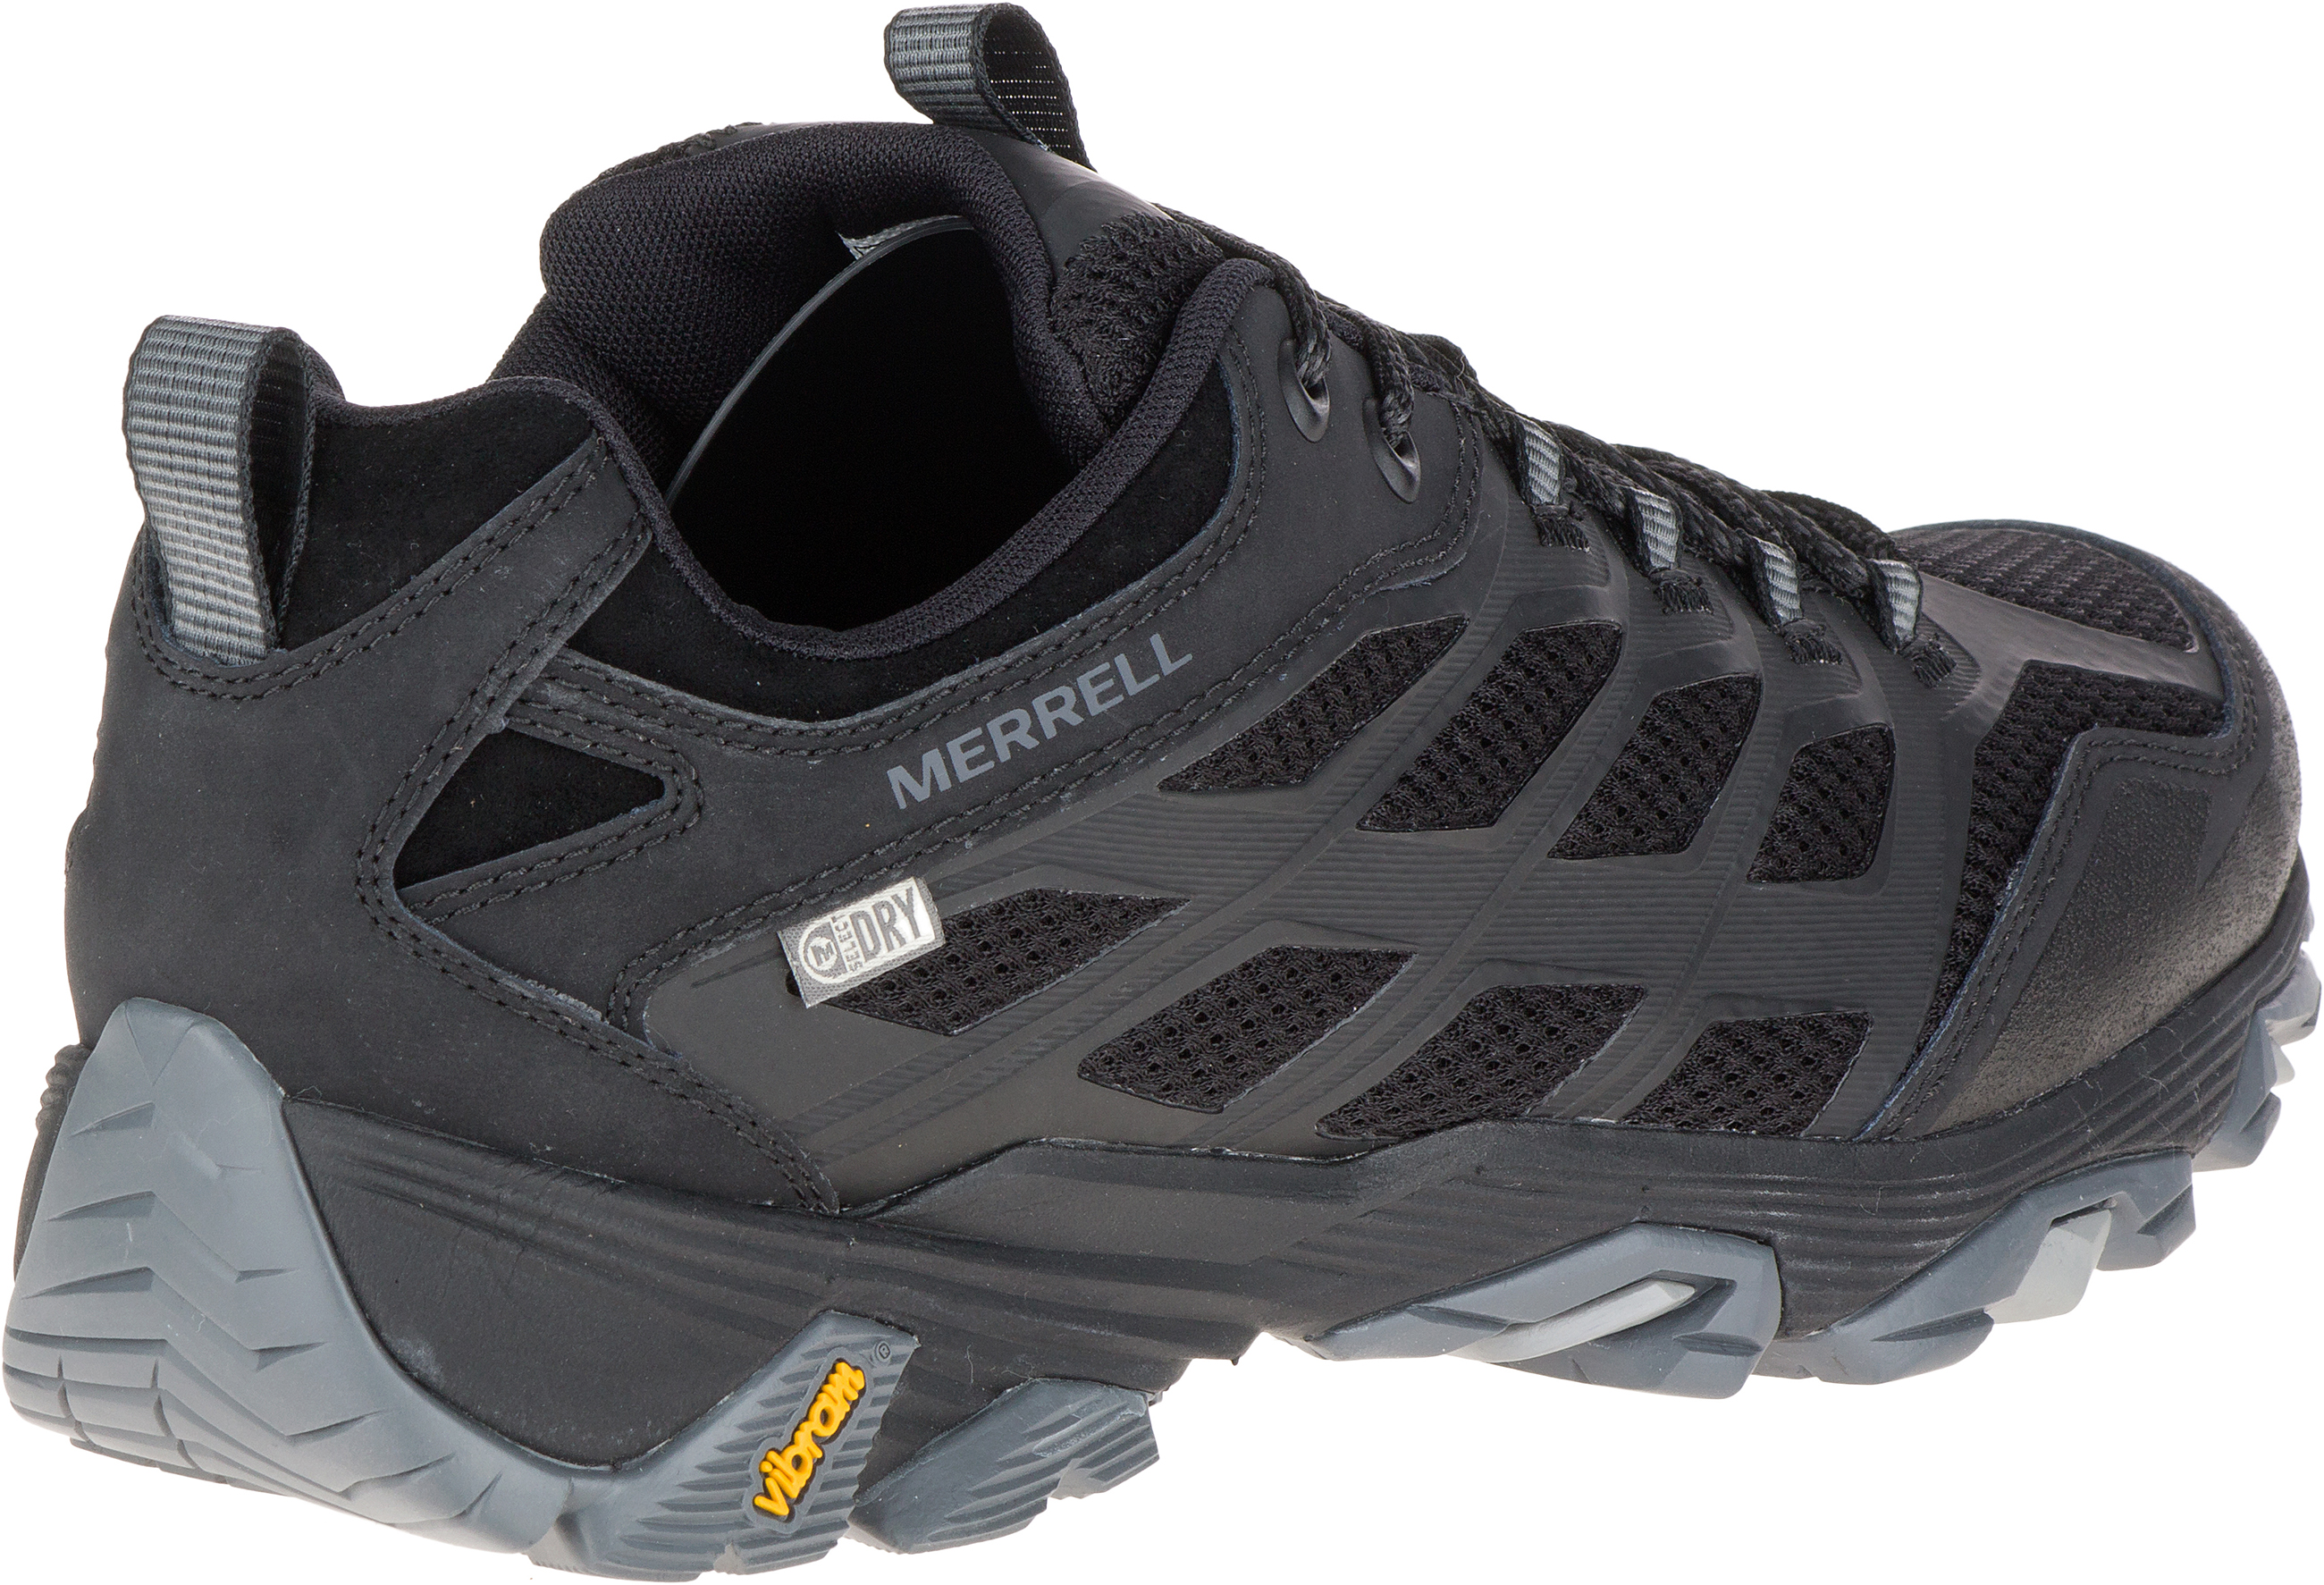 2f8bbd9127b1 Merrell Moab FST Waterproof Light Trail Shoes - Men s